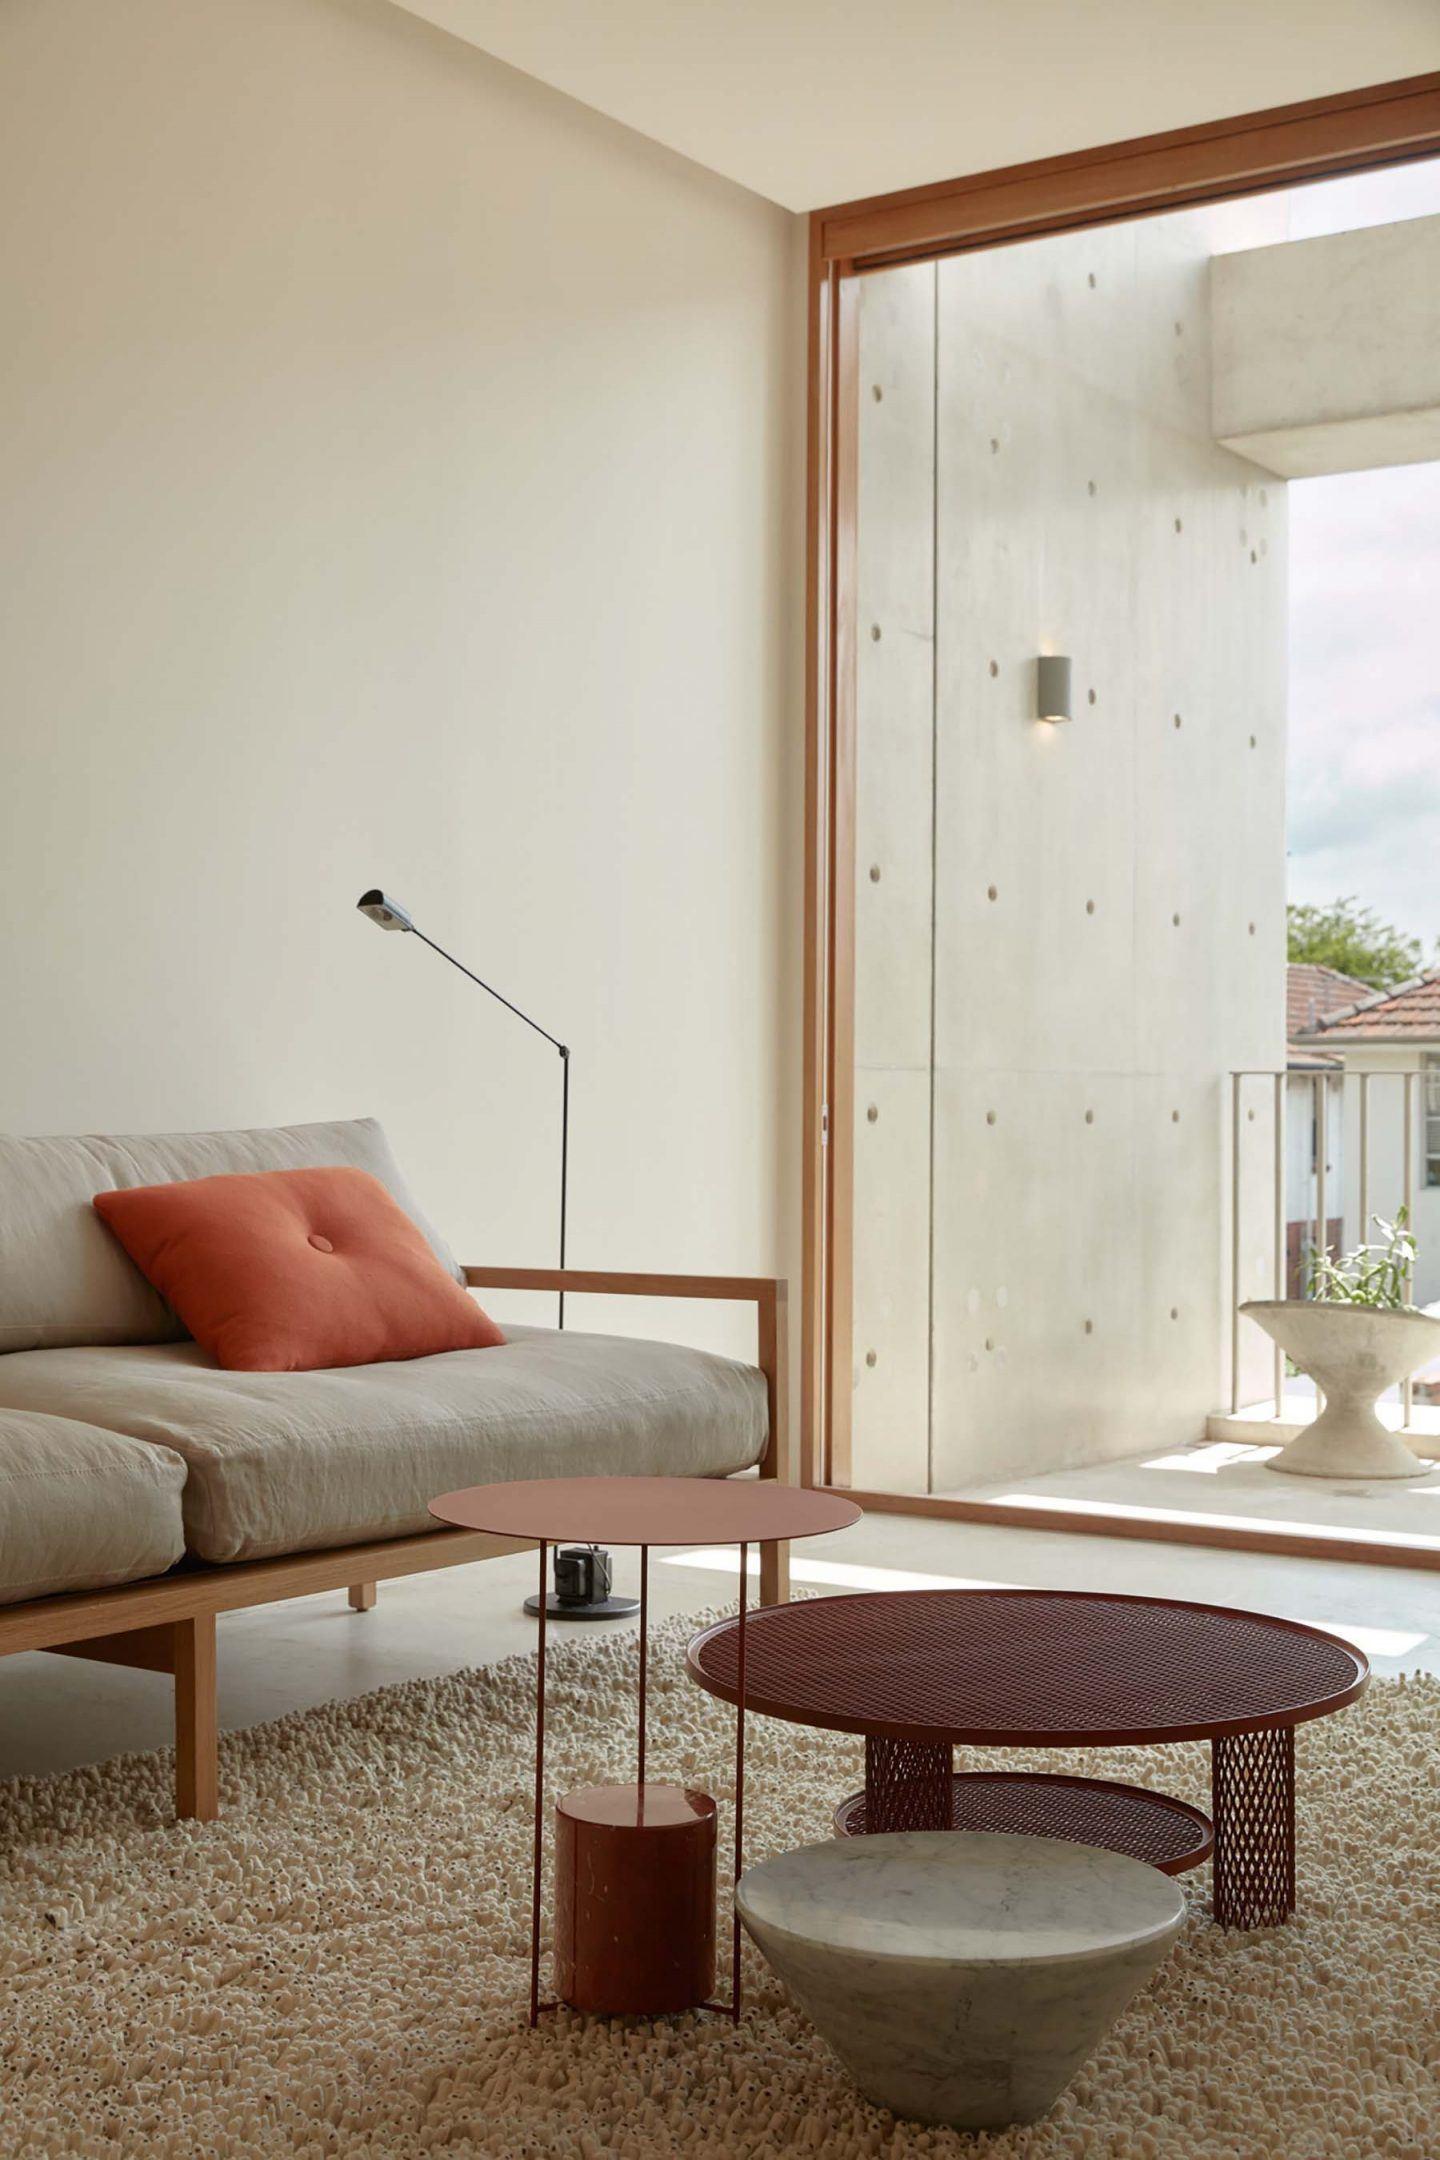 IGNANT-Architecture-Oliver-du-Puy-Architects-Skinny-House-12